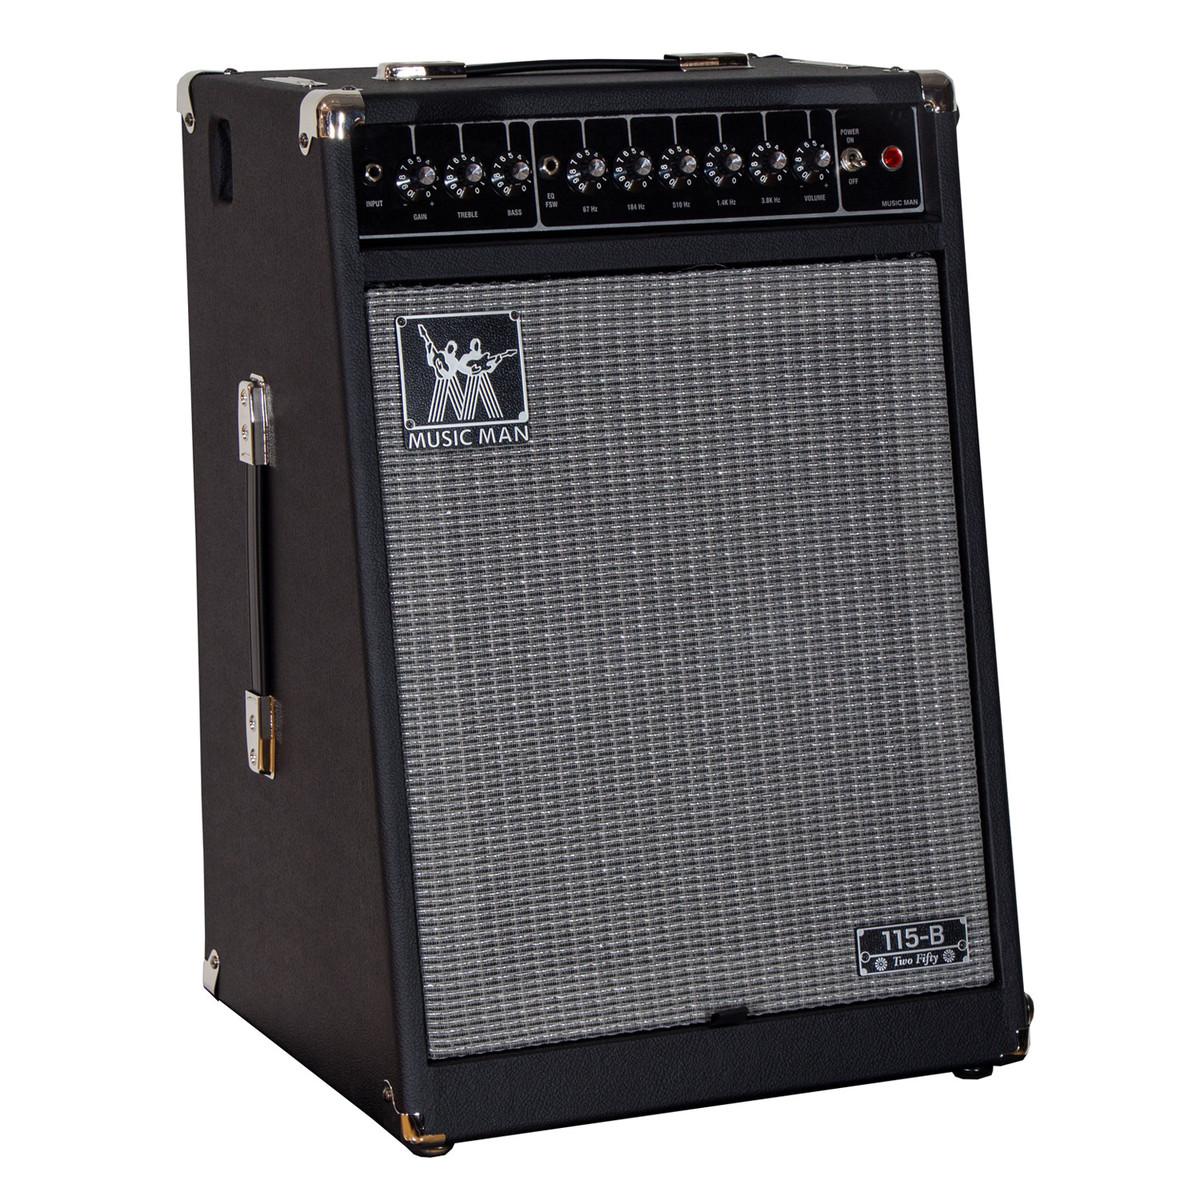 music man 115 b250 bass amp at. Black Bedroom Furniture Sets. Home Design Ideas